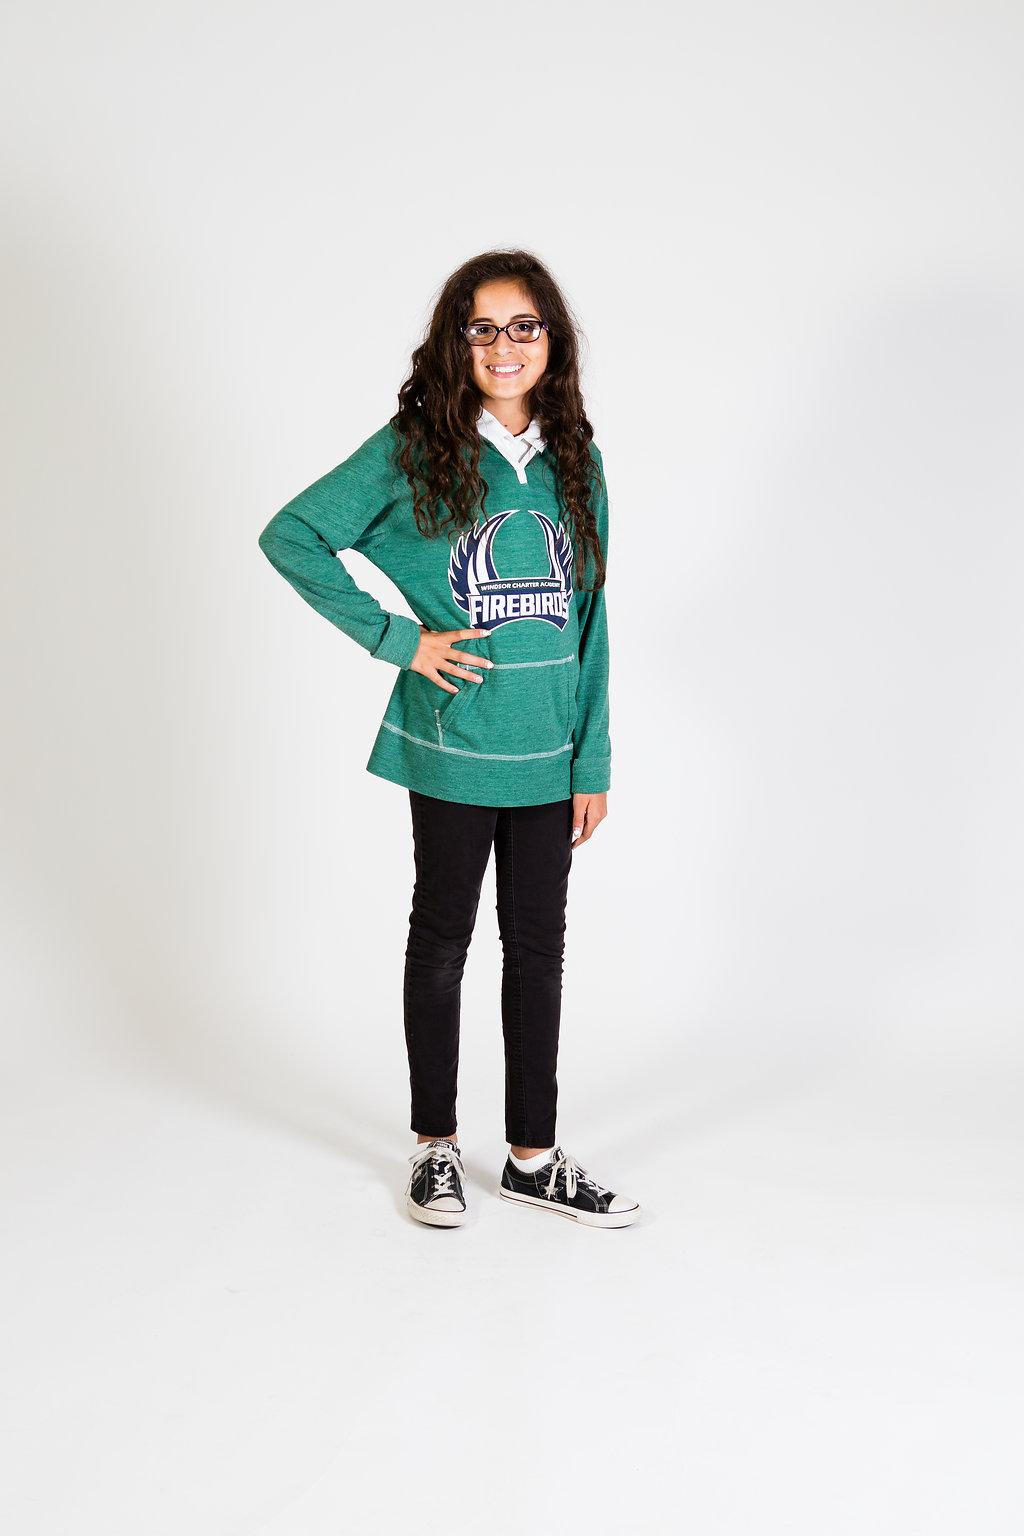 16JuneWCA_Uniforms132-Edit.jpg